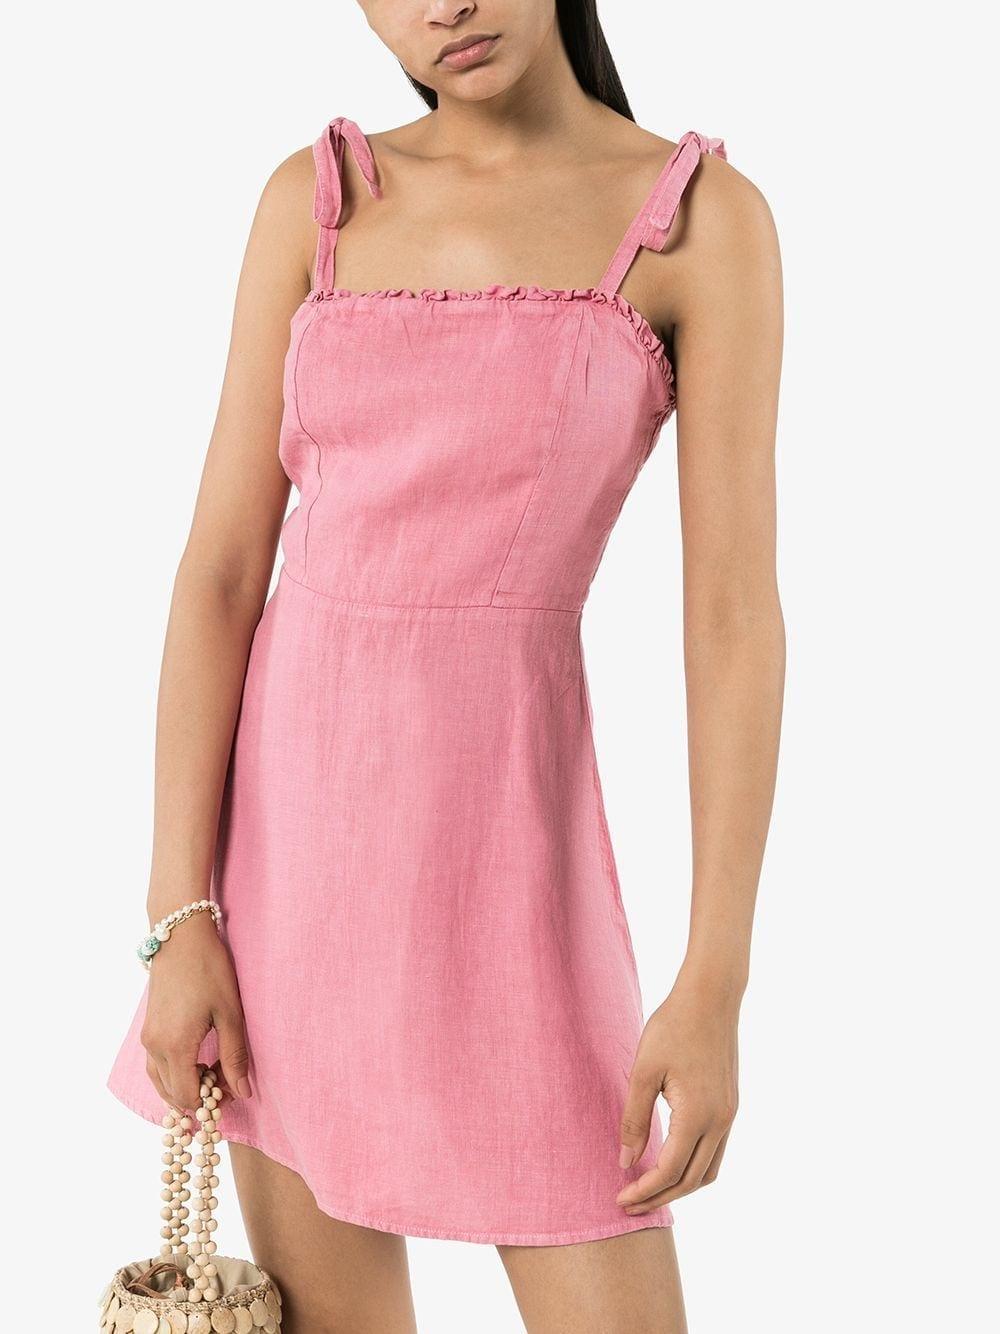 HONORINE Poppy Dress